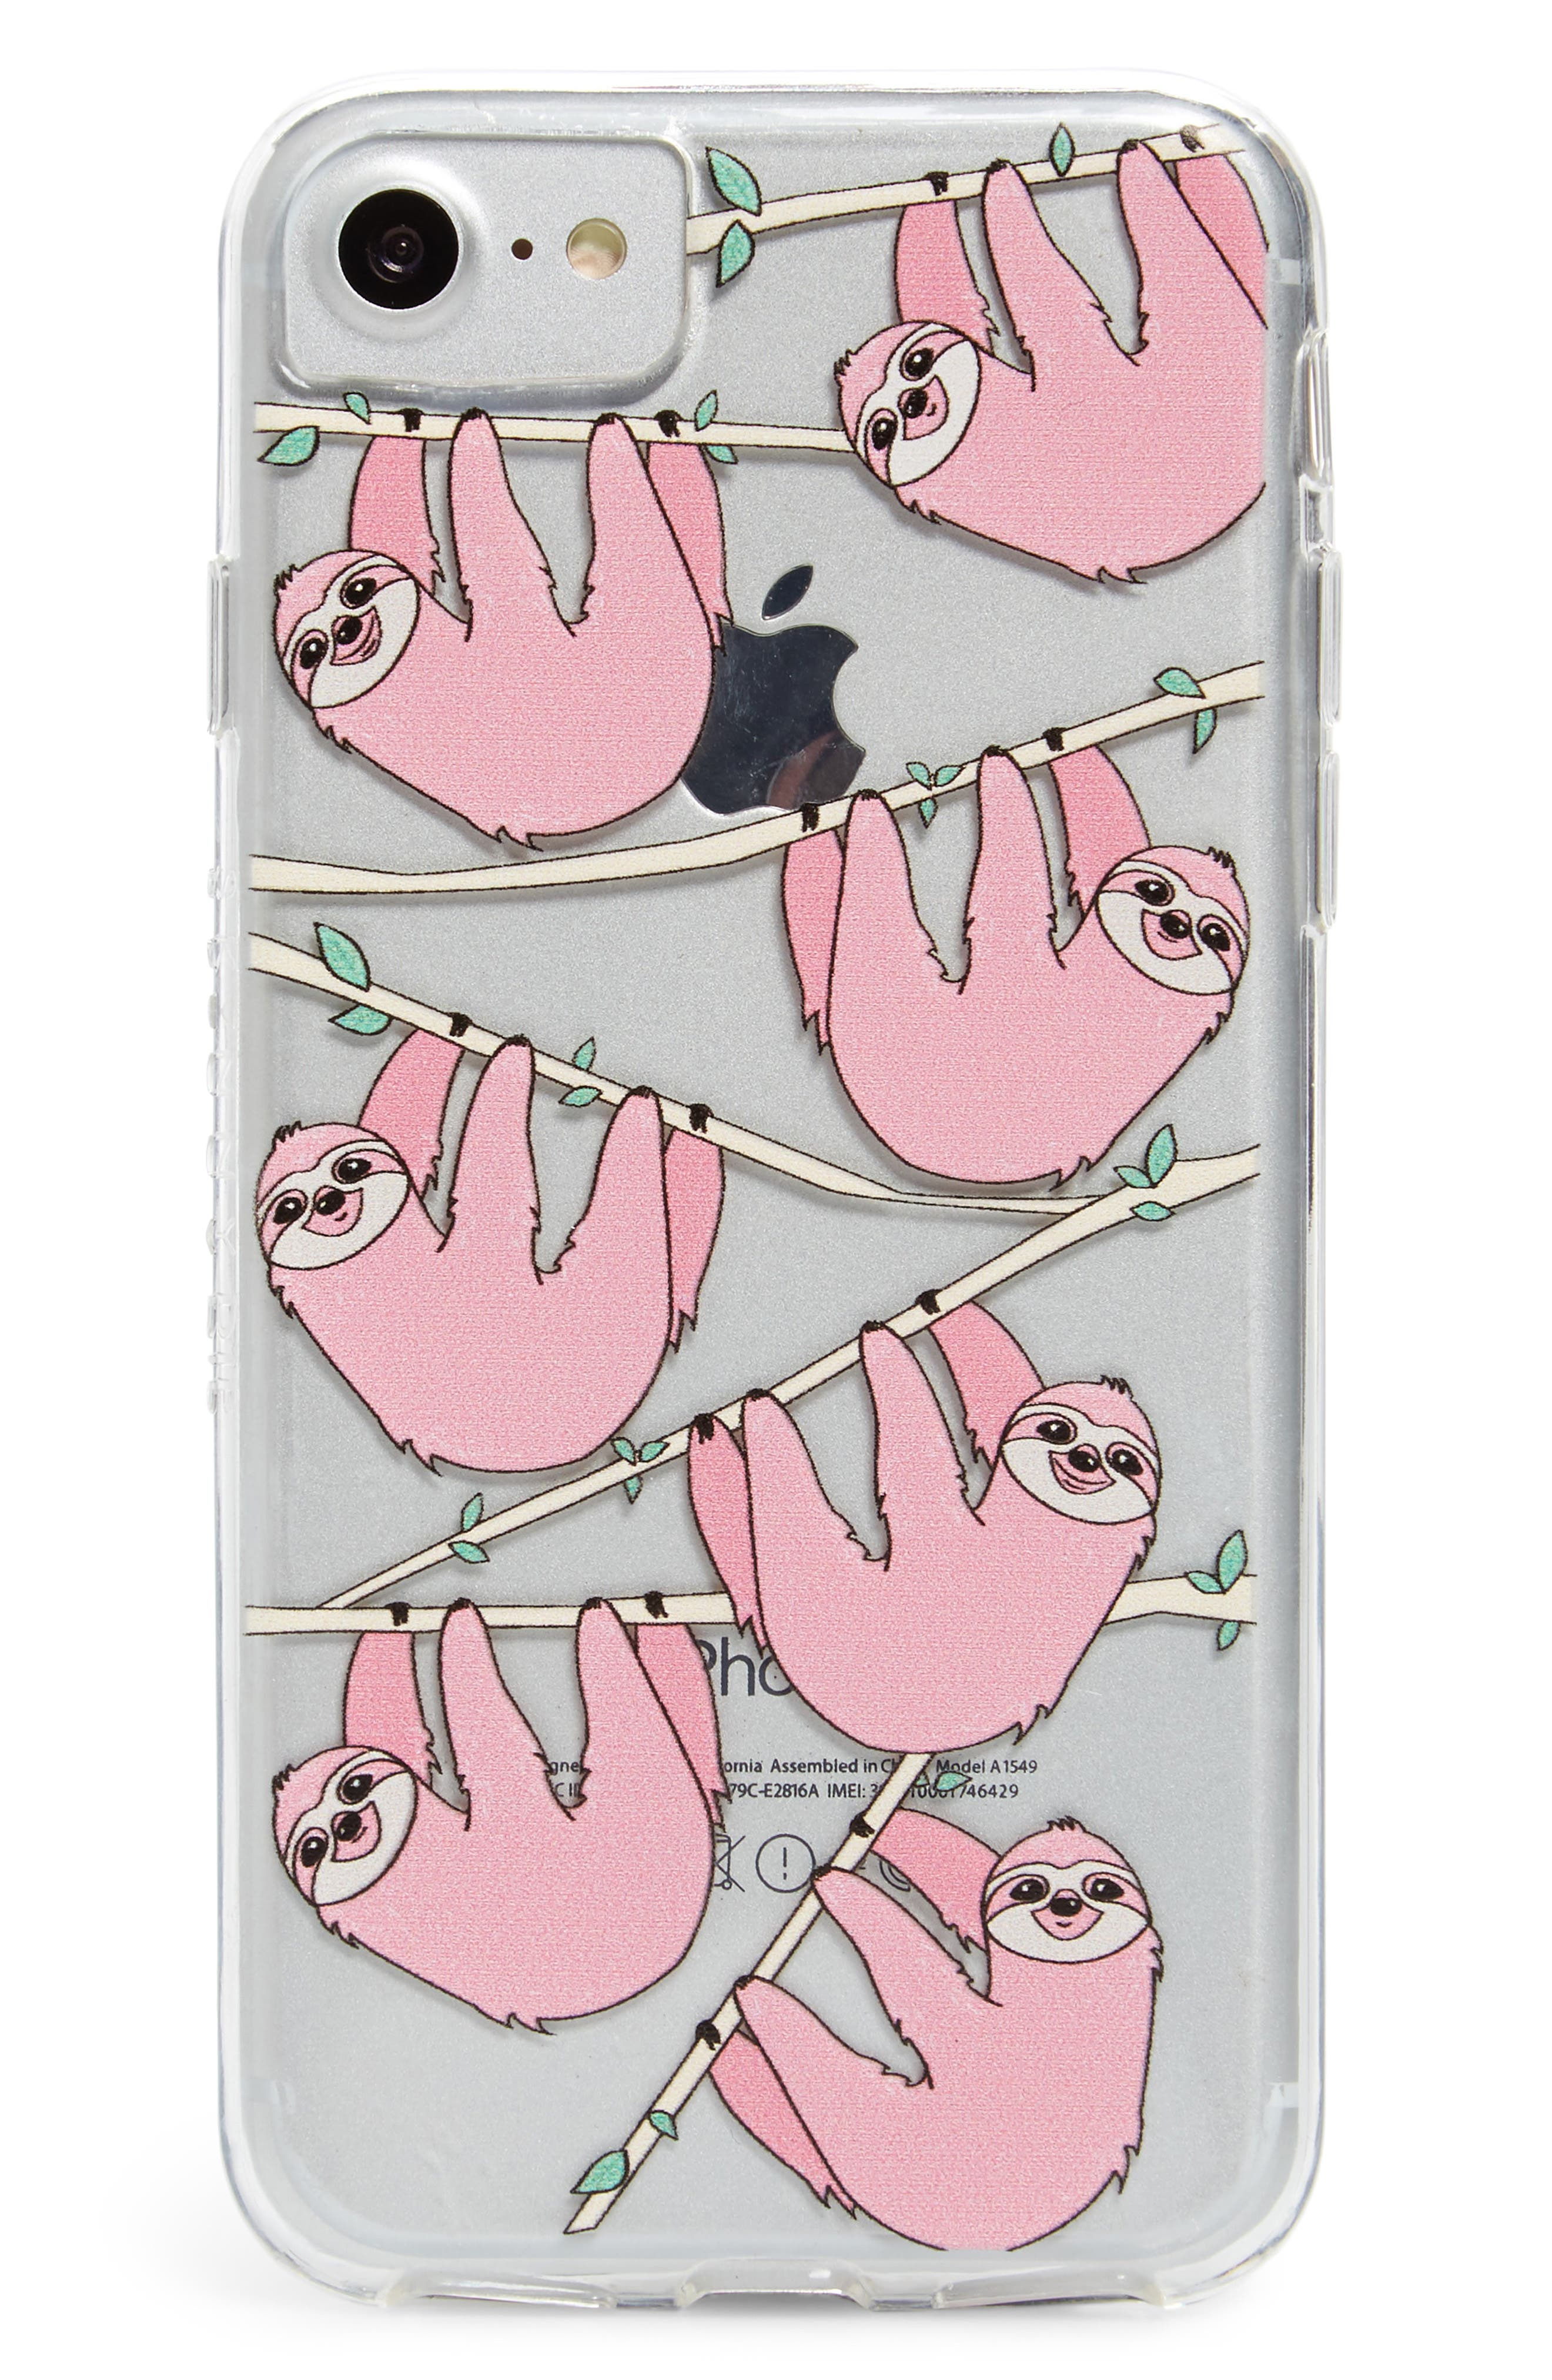 Skinny Dip Sloth iPhone 6/6s/7/8 & 6/6s/7/8 Plus Case